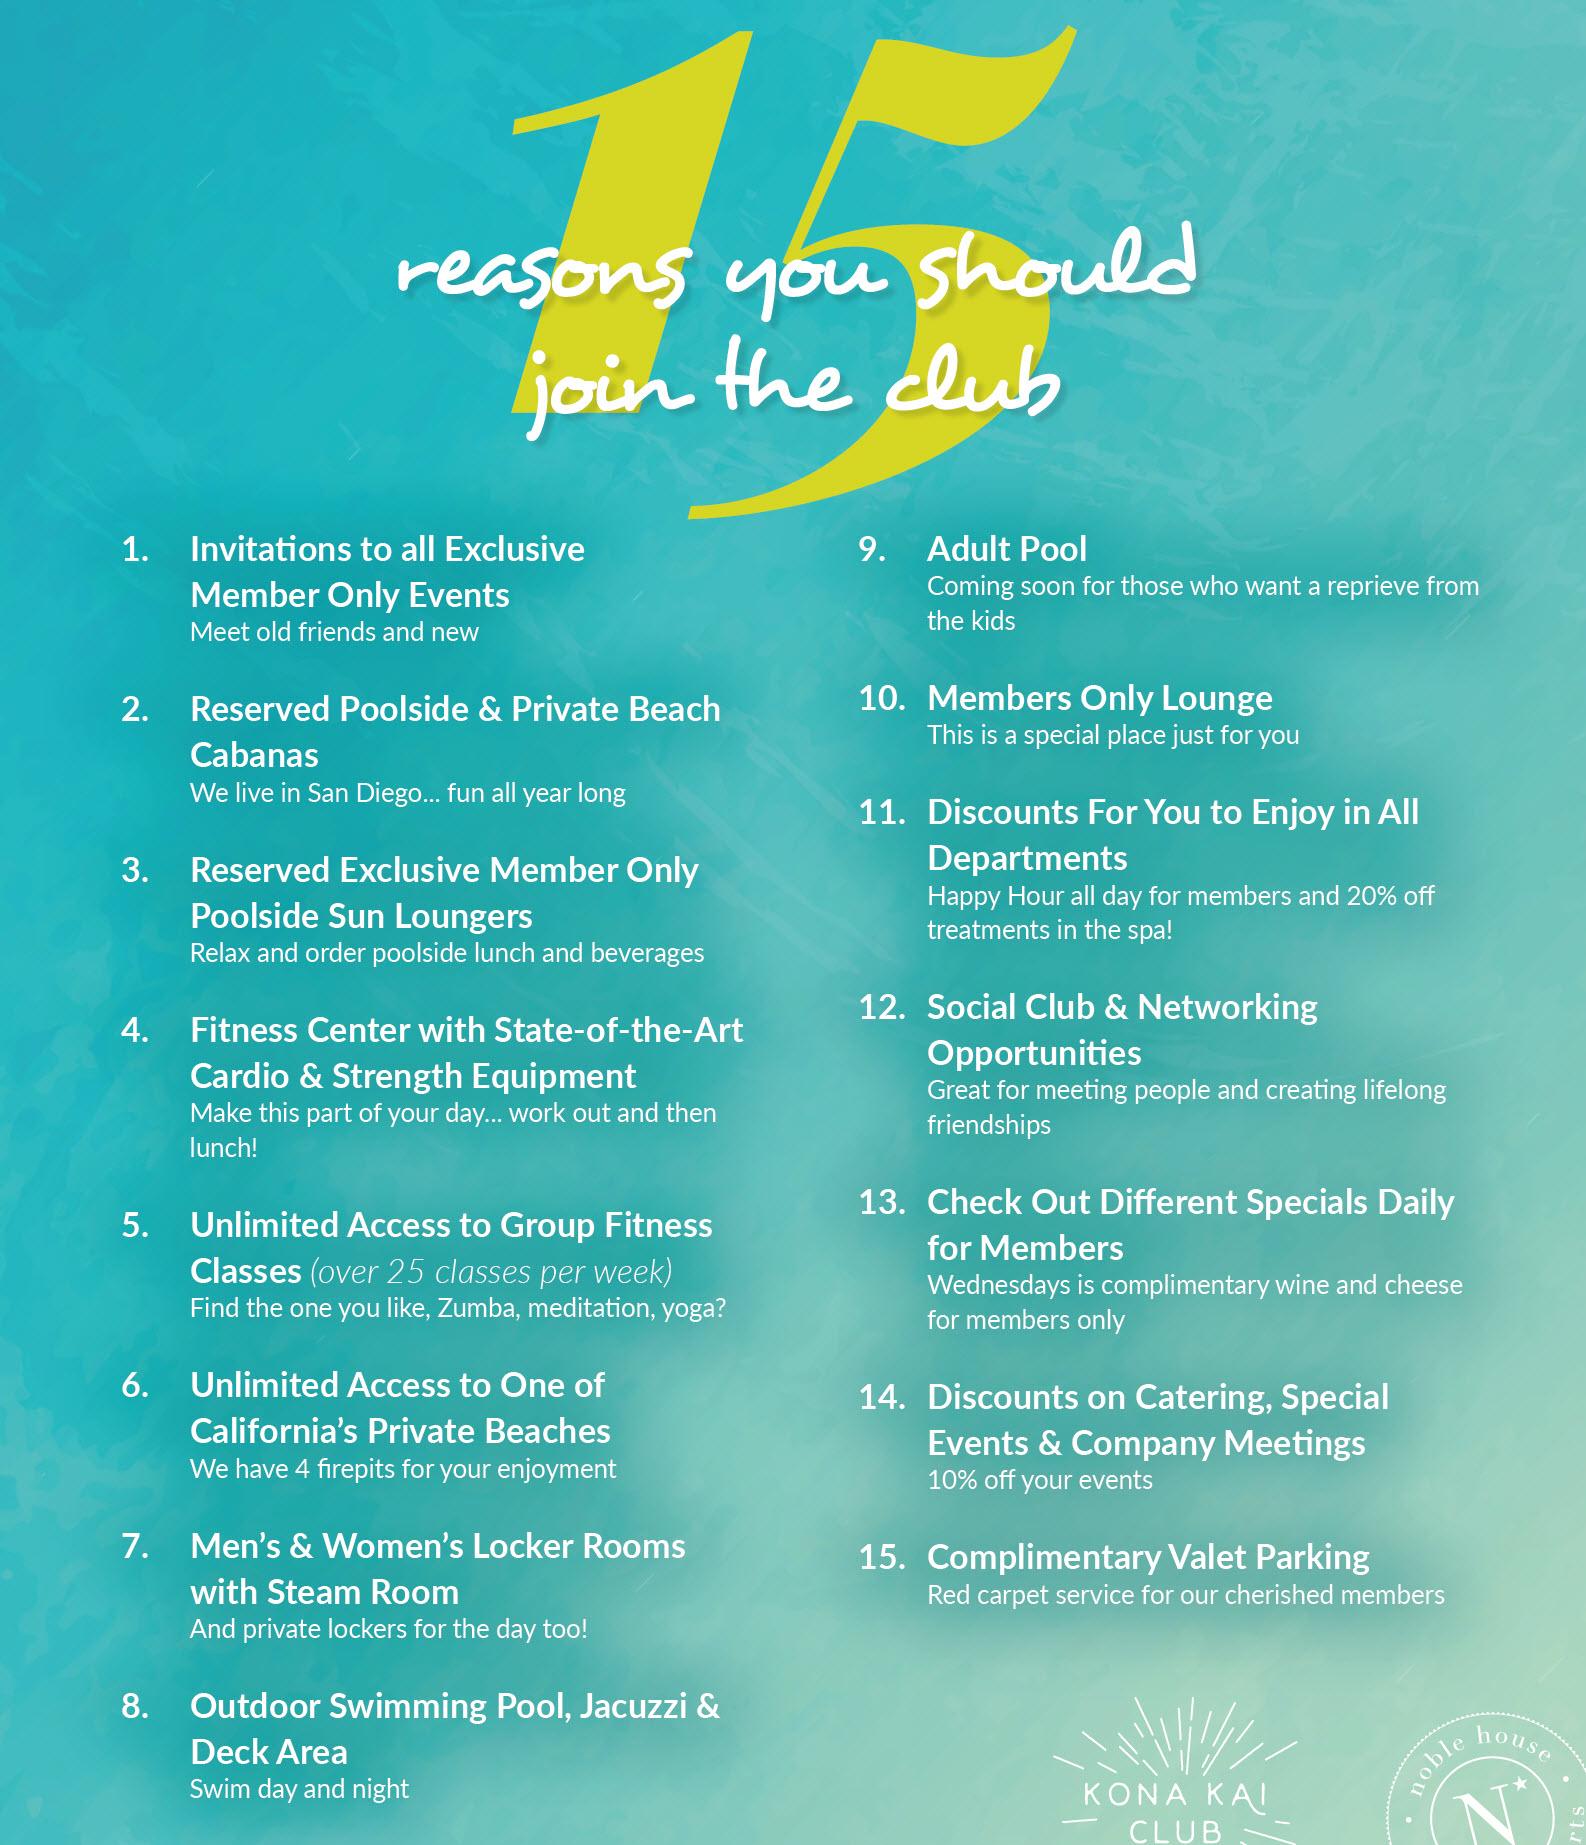 15-reasons